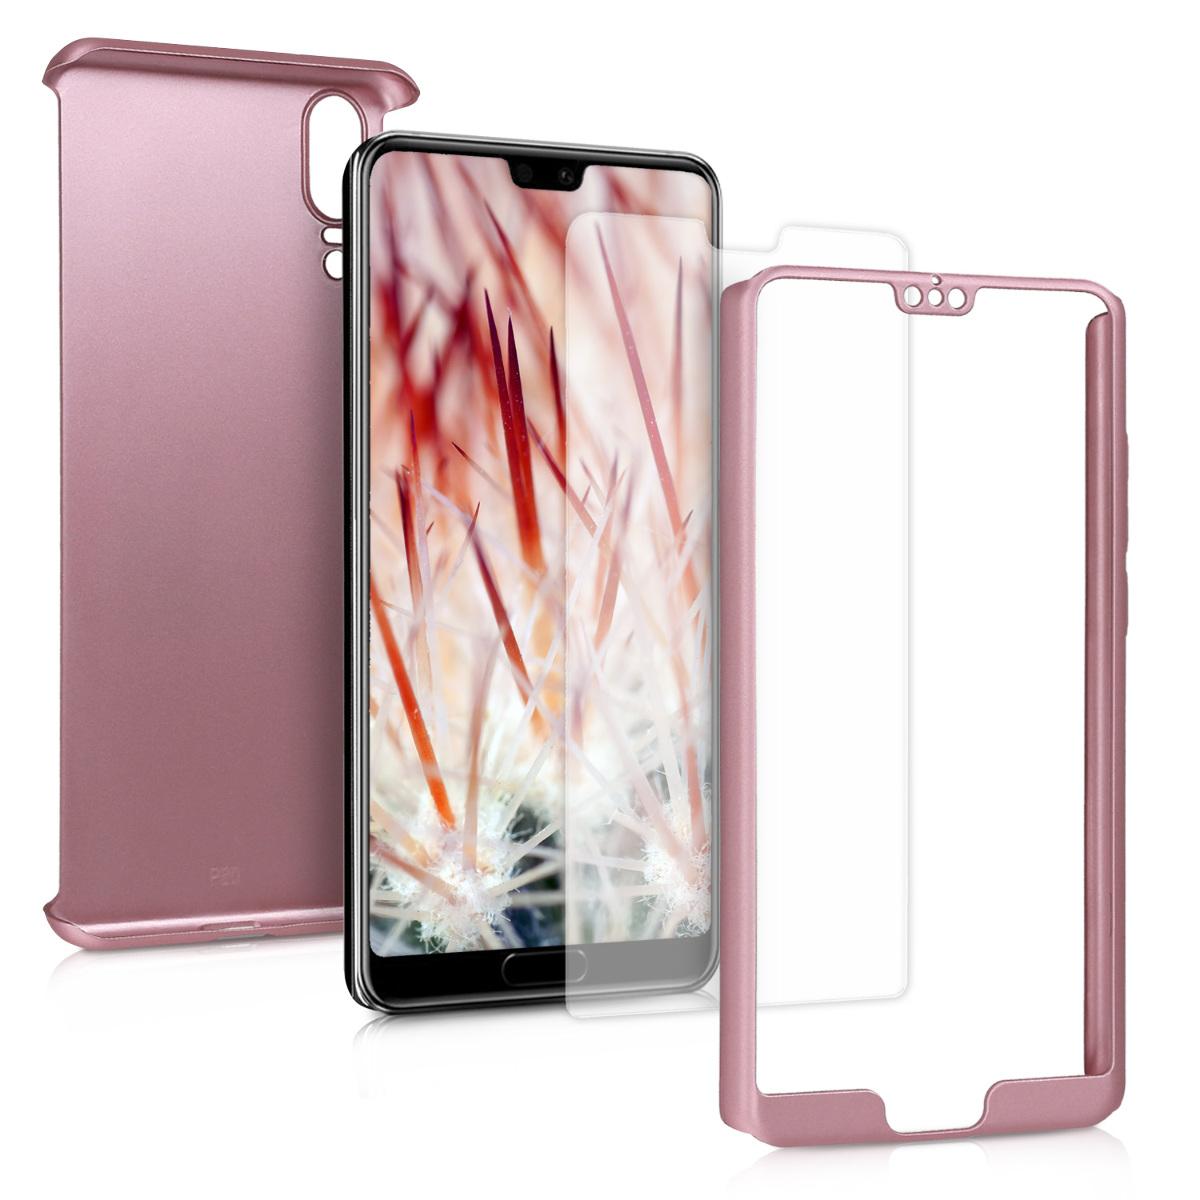 KW Θήκη Full Body για Huawei P20 & Tempered Glass - Μεταλλικό ροζ χαλκινο (45554.31)